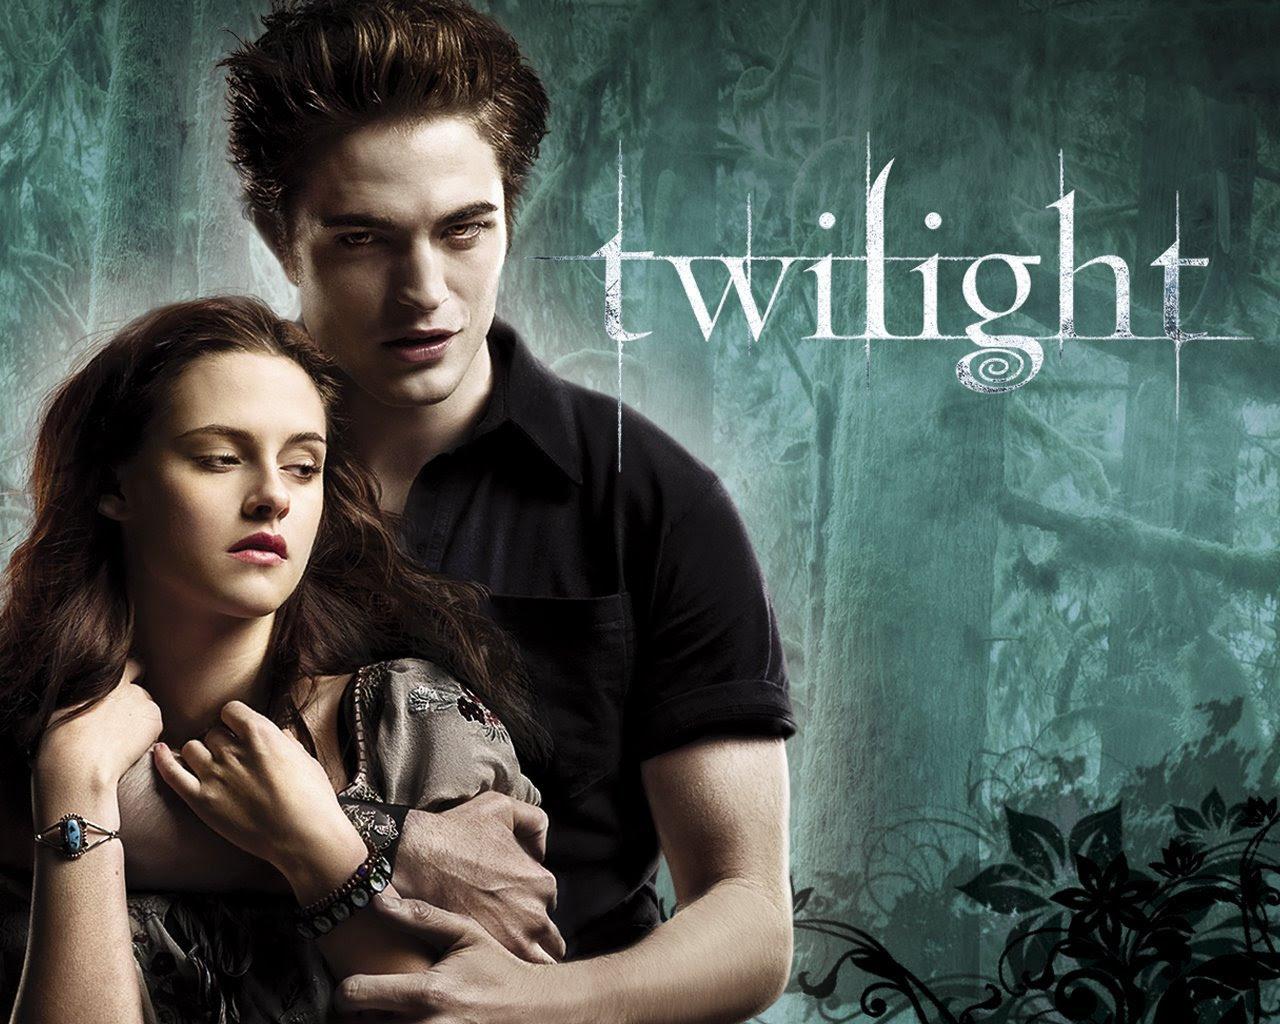 Twilight Wallpaper Edward Bella Jacob Wallpaper 35898657 Fanpop